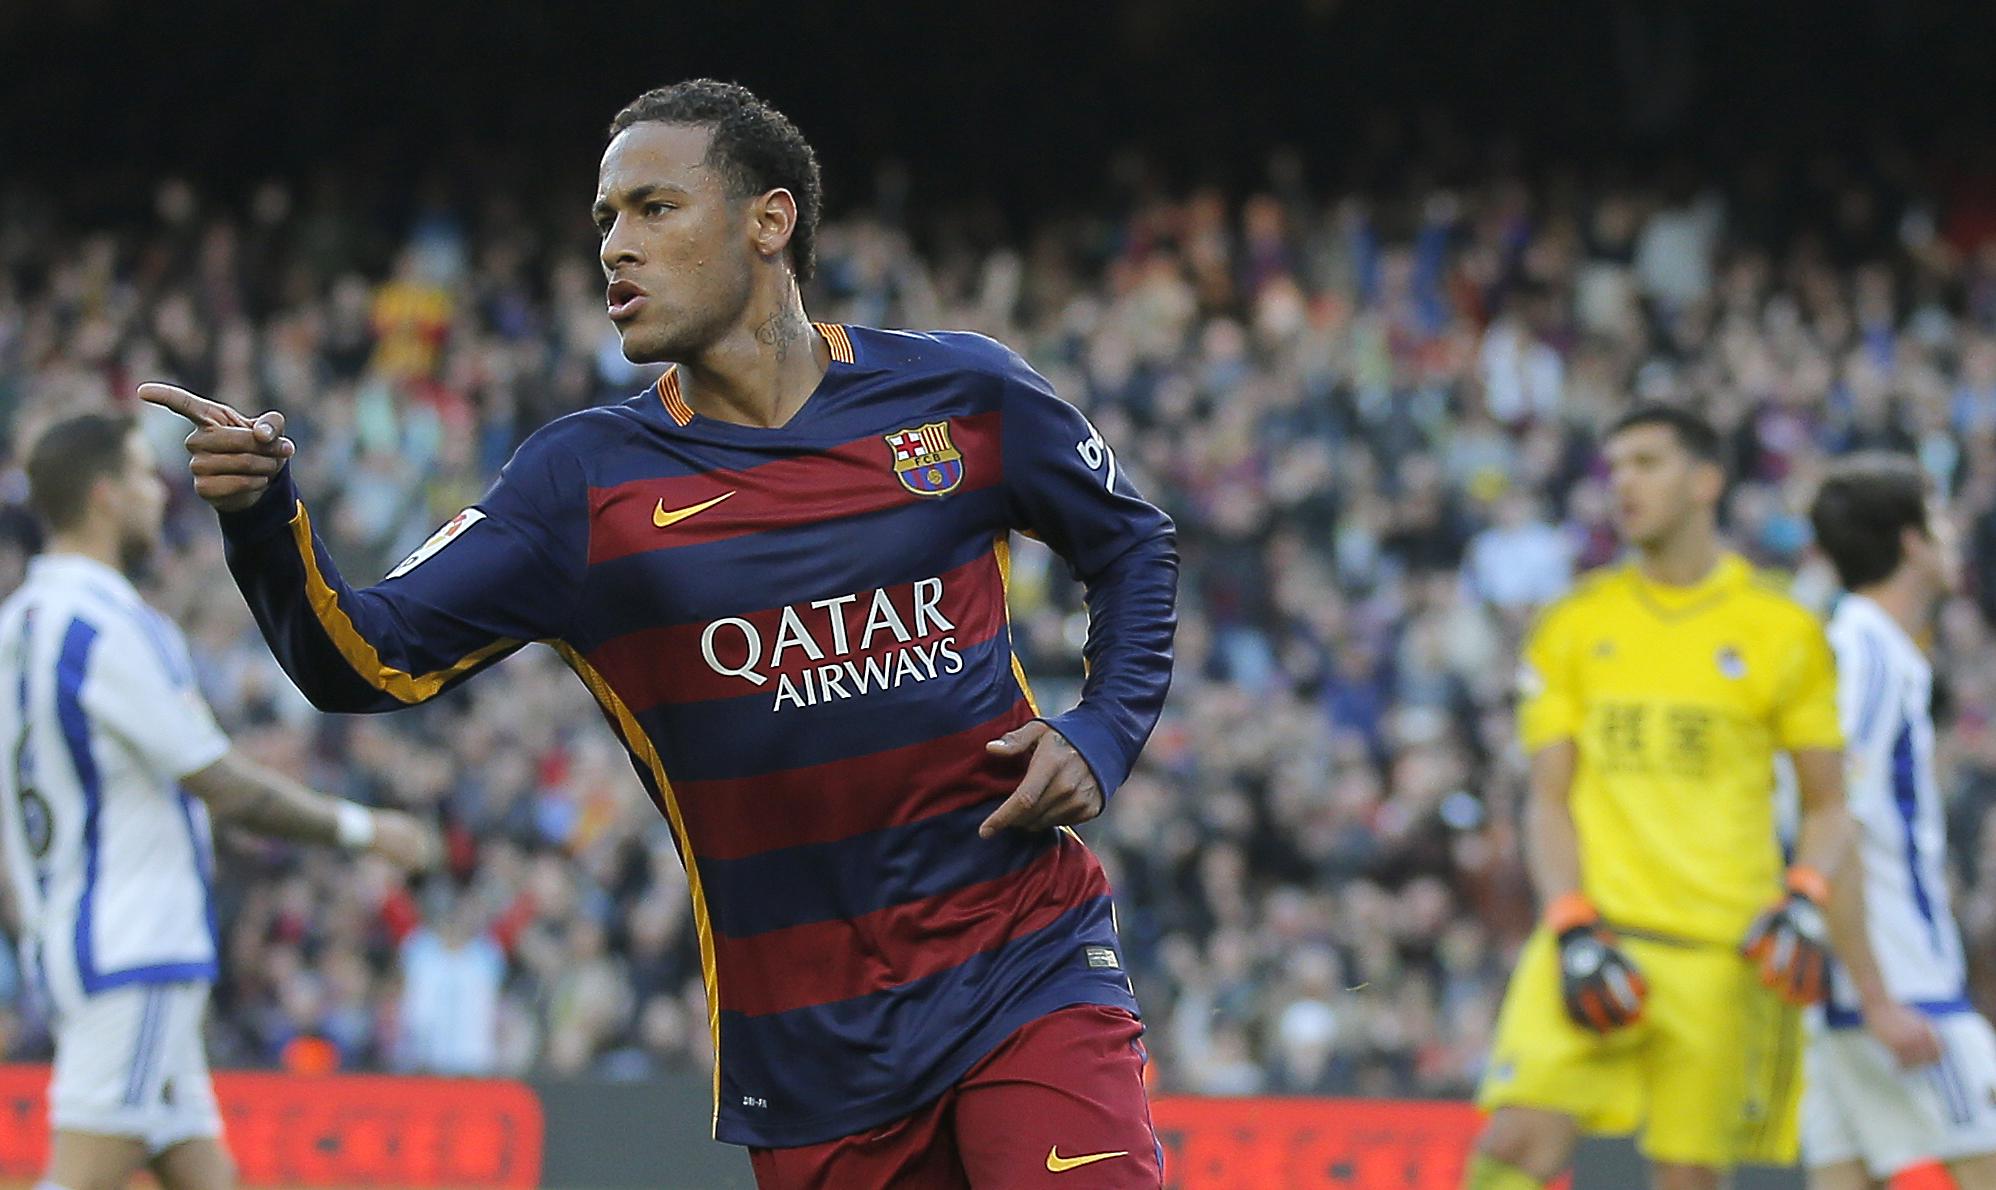 FC Barcelona's Neymar reacts after scoring against Real Sociedad during a Spanish La Liga soccer match at the Camp Nou stadium in Barcelona, Spain, Saturday, Nov. 28, 2015. (AP Photo/Manu Fernandez)